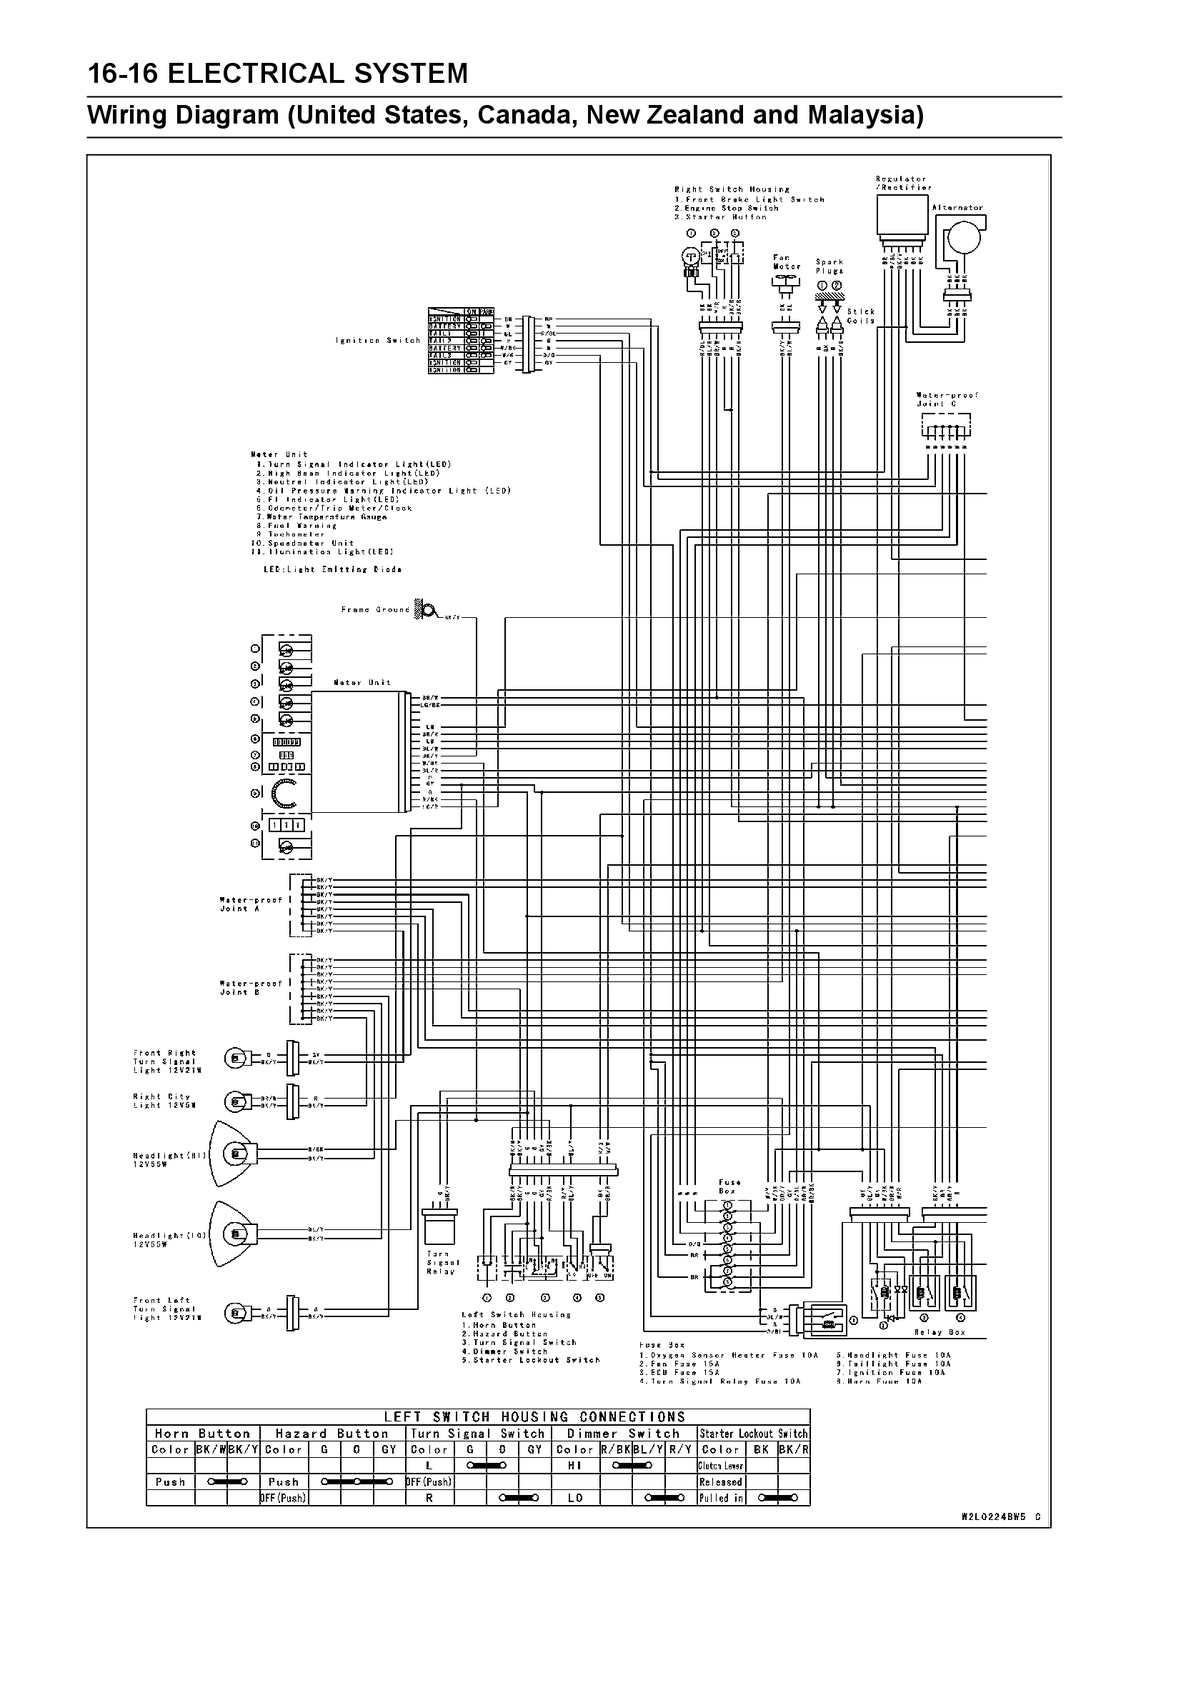 Xv920 Wiring Diagram Great Design Of 1995 Yamaha Virago 1100 Gpz Electrical Schematic 1982 82 920 Specs